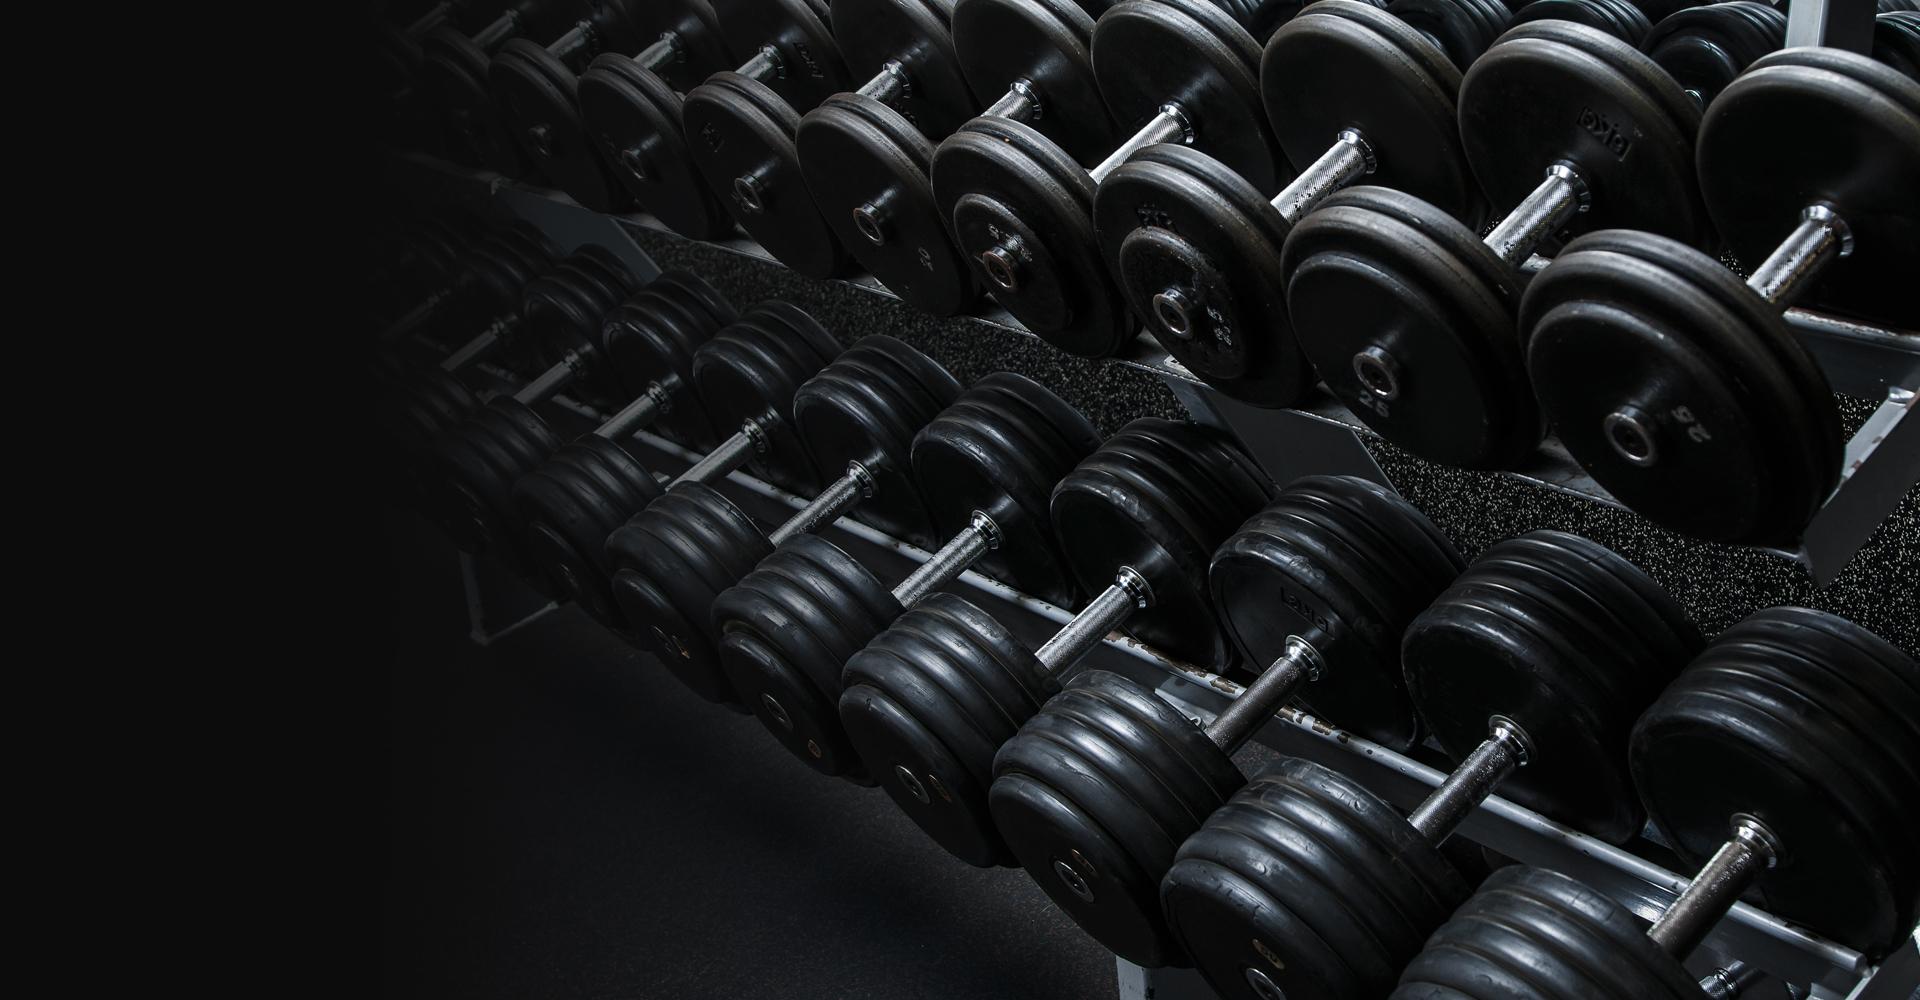 atlas-gym-2-kenosha-wisconsin-equipment